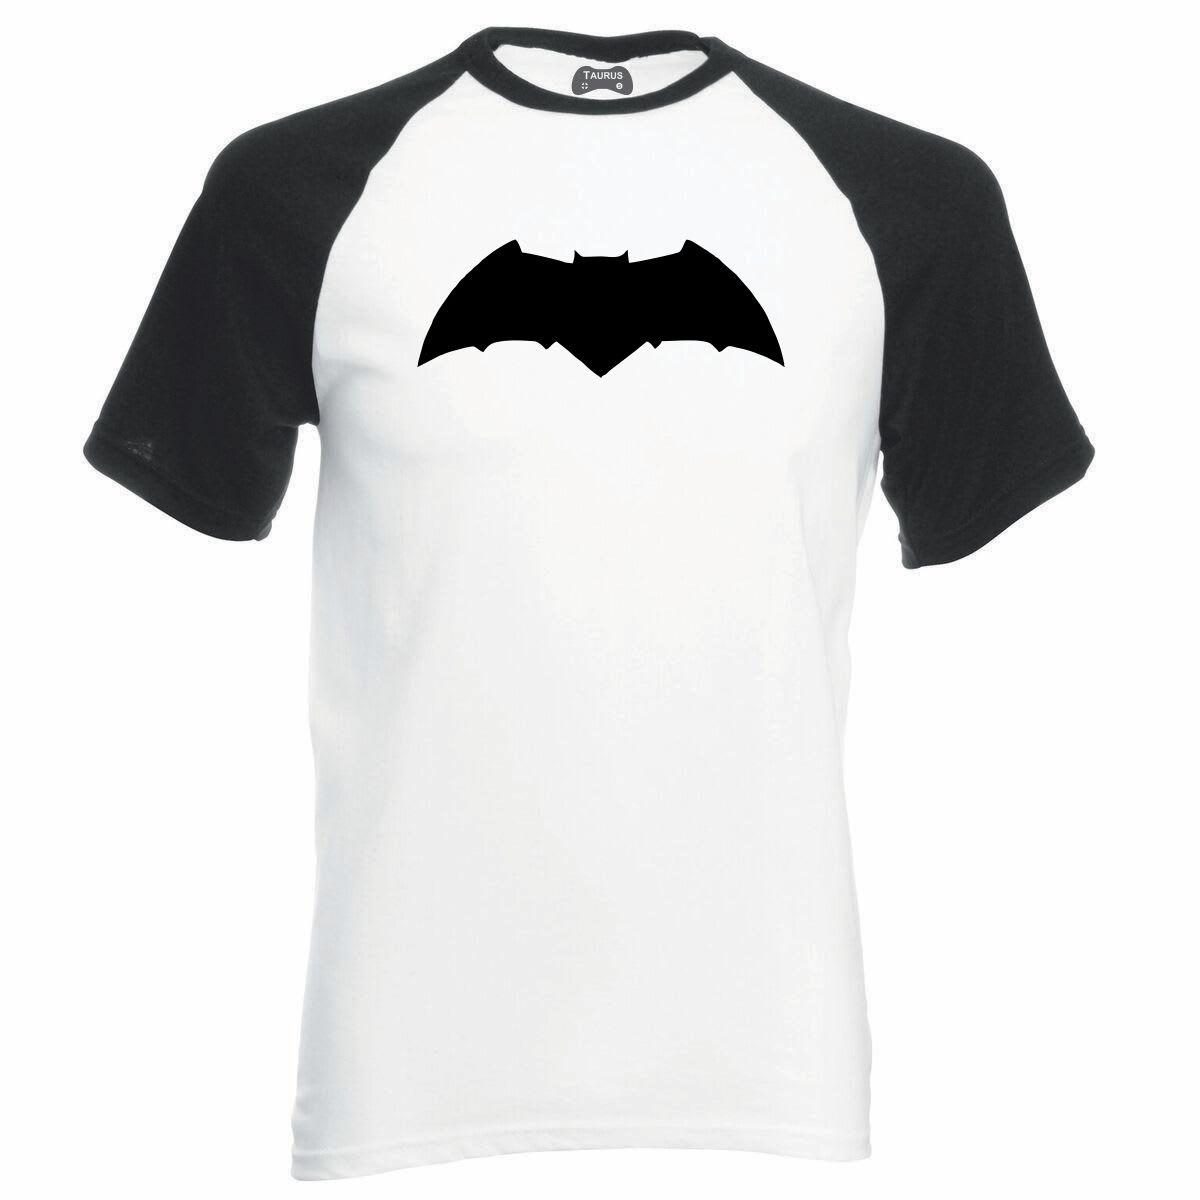 The New Bat Raglan T-Shirt